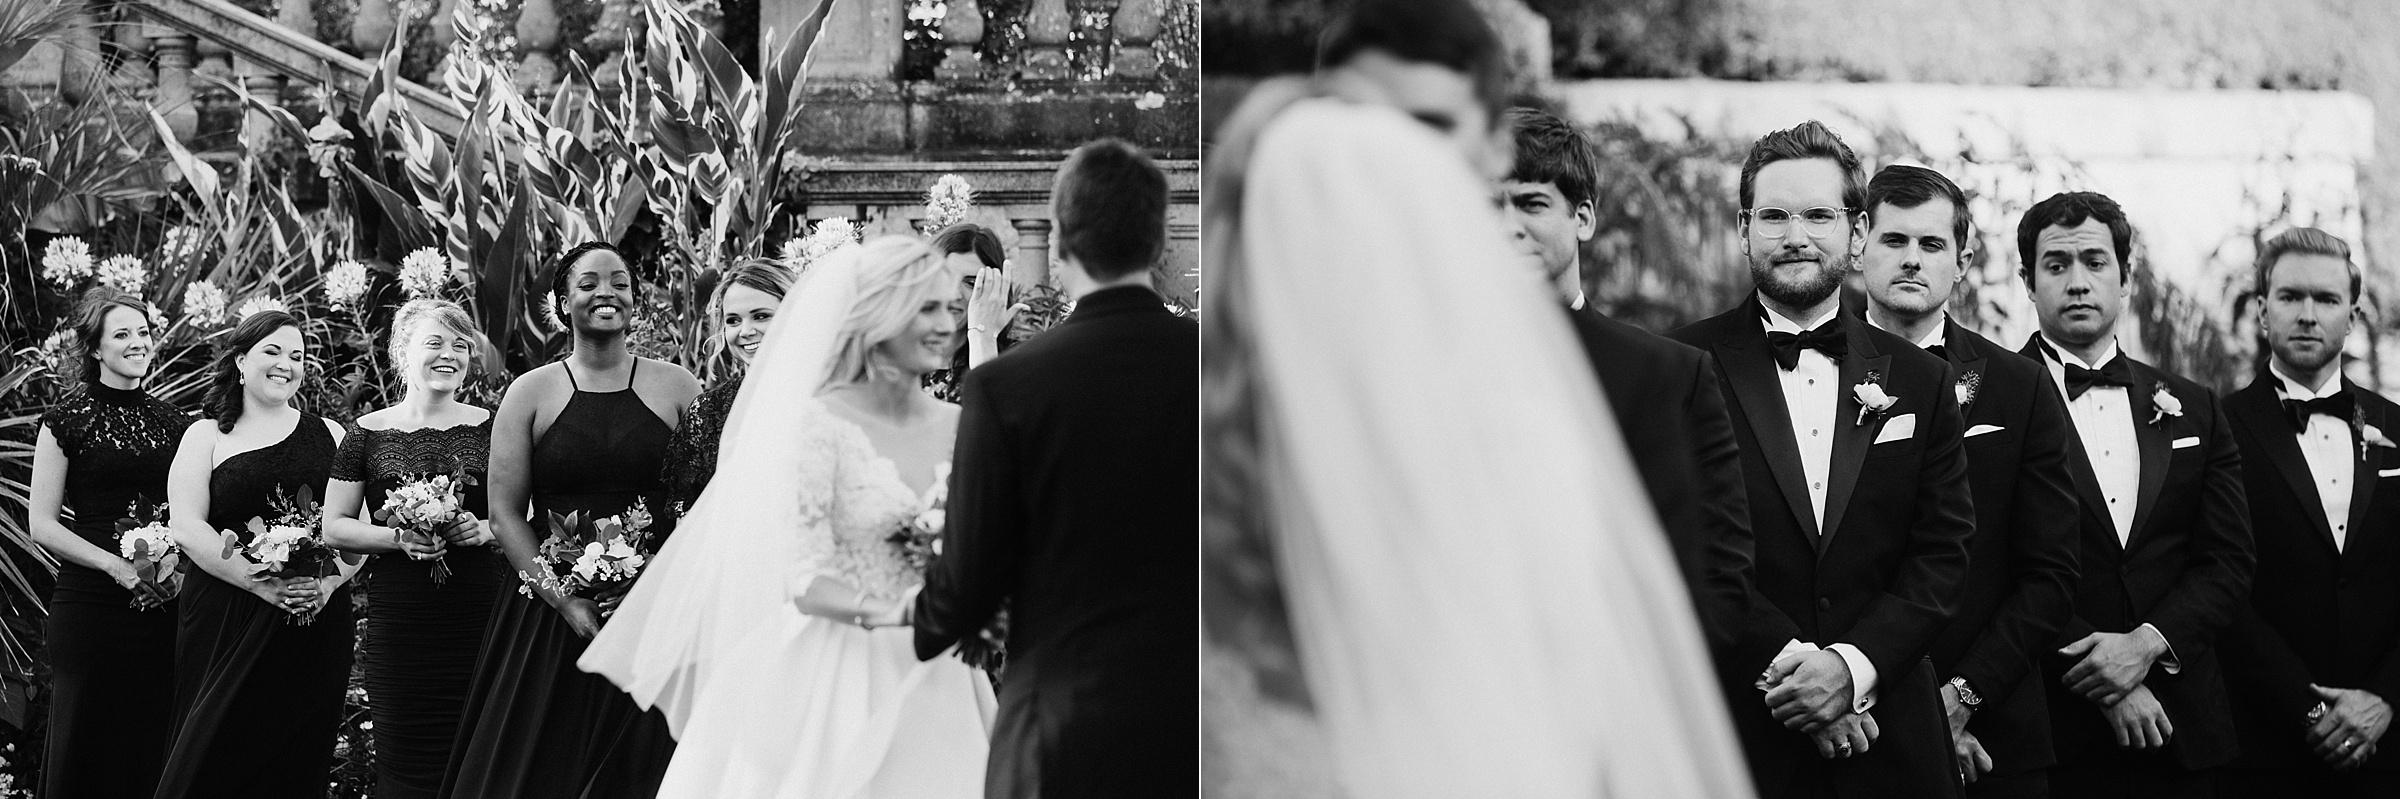 Bridal party watches couple Hatley Castle Wedding Photographer